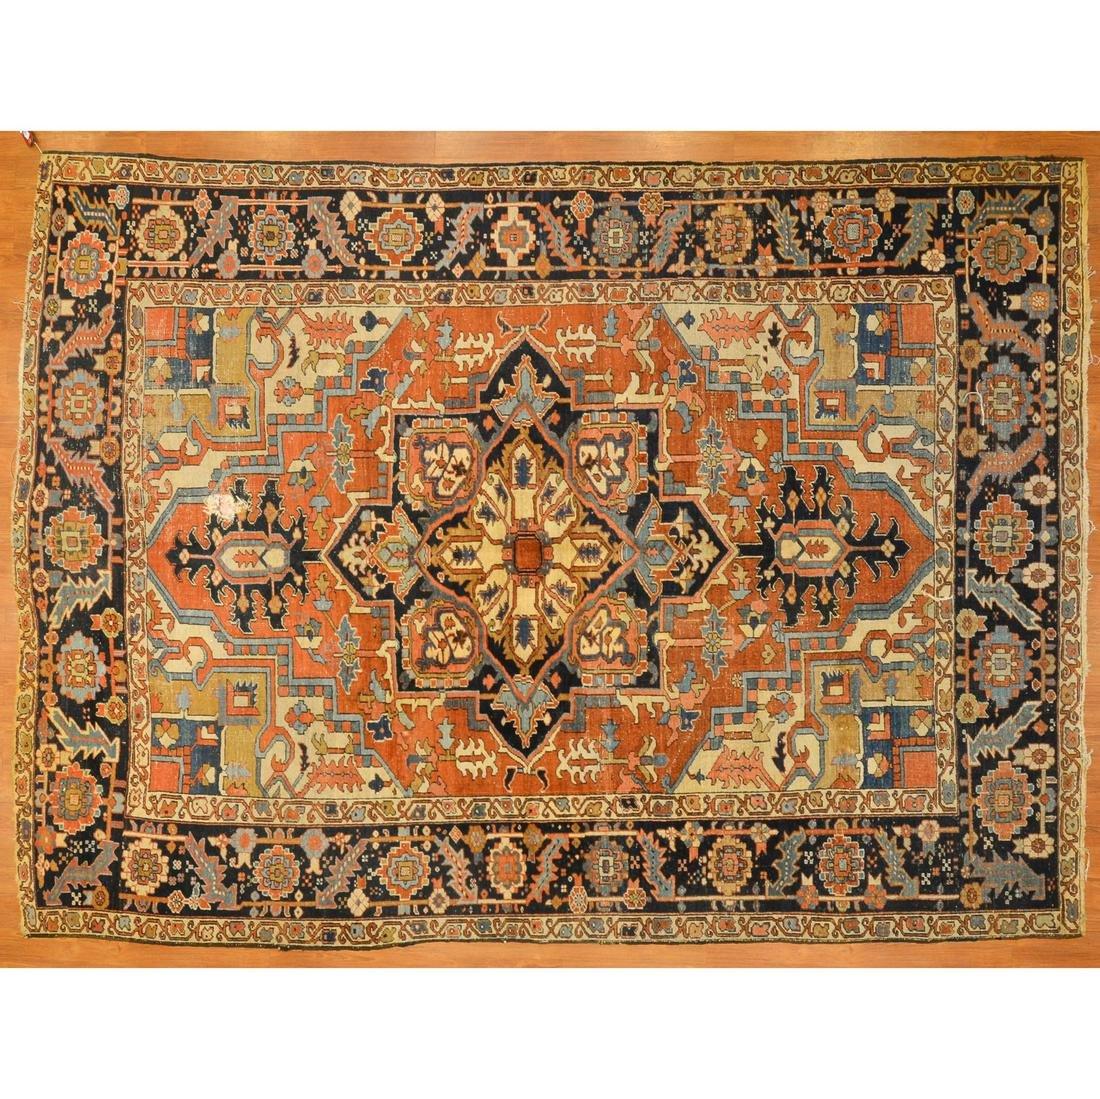 Antique Heriz Rug, Persia, 7.10 x 10.9